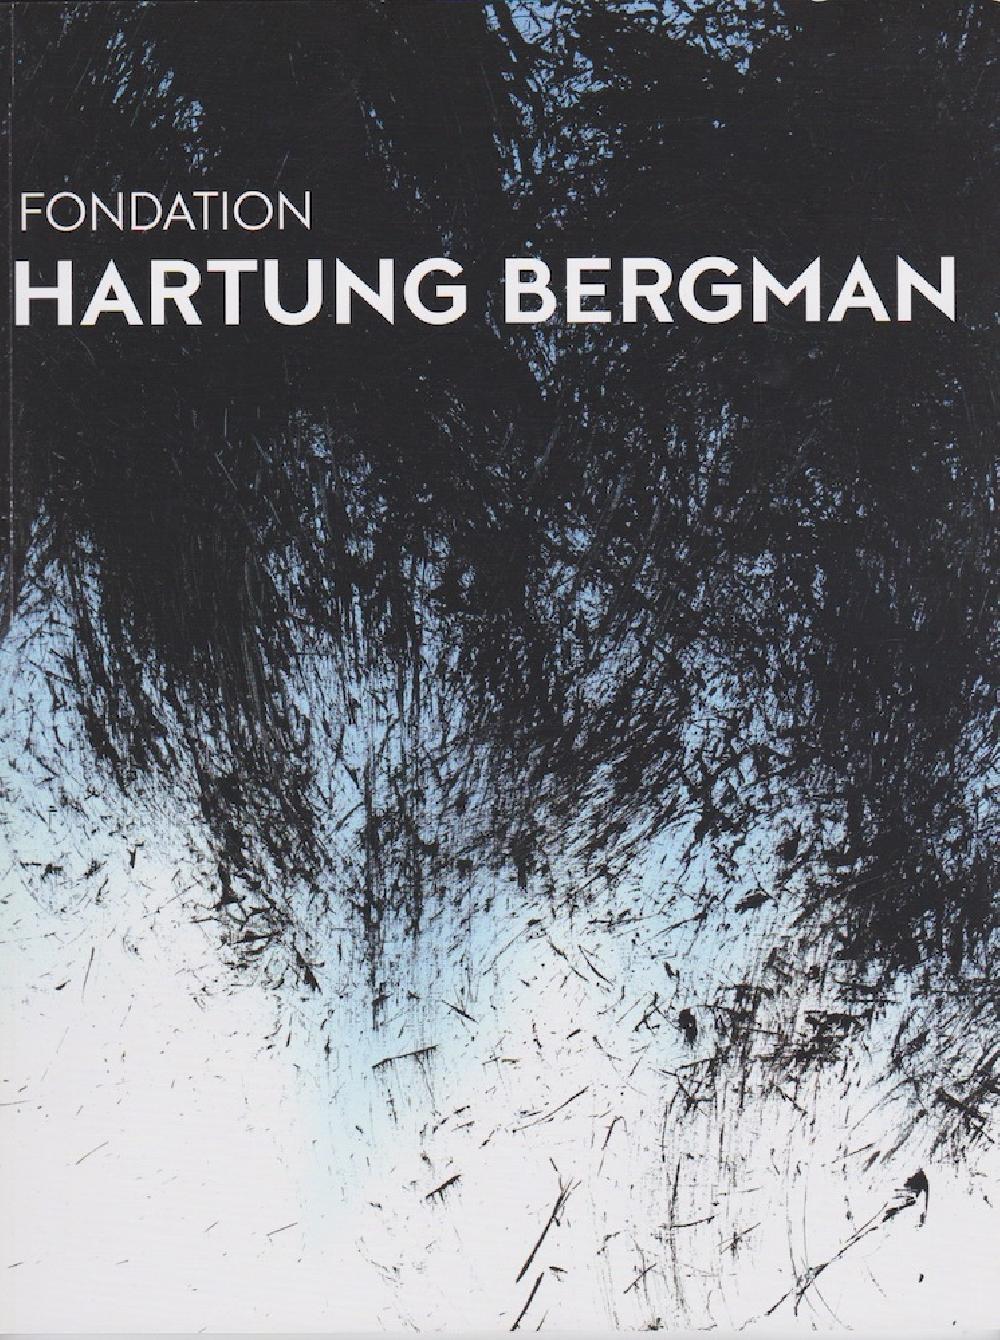 Fondation Hartung Bergman